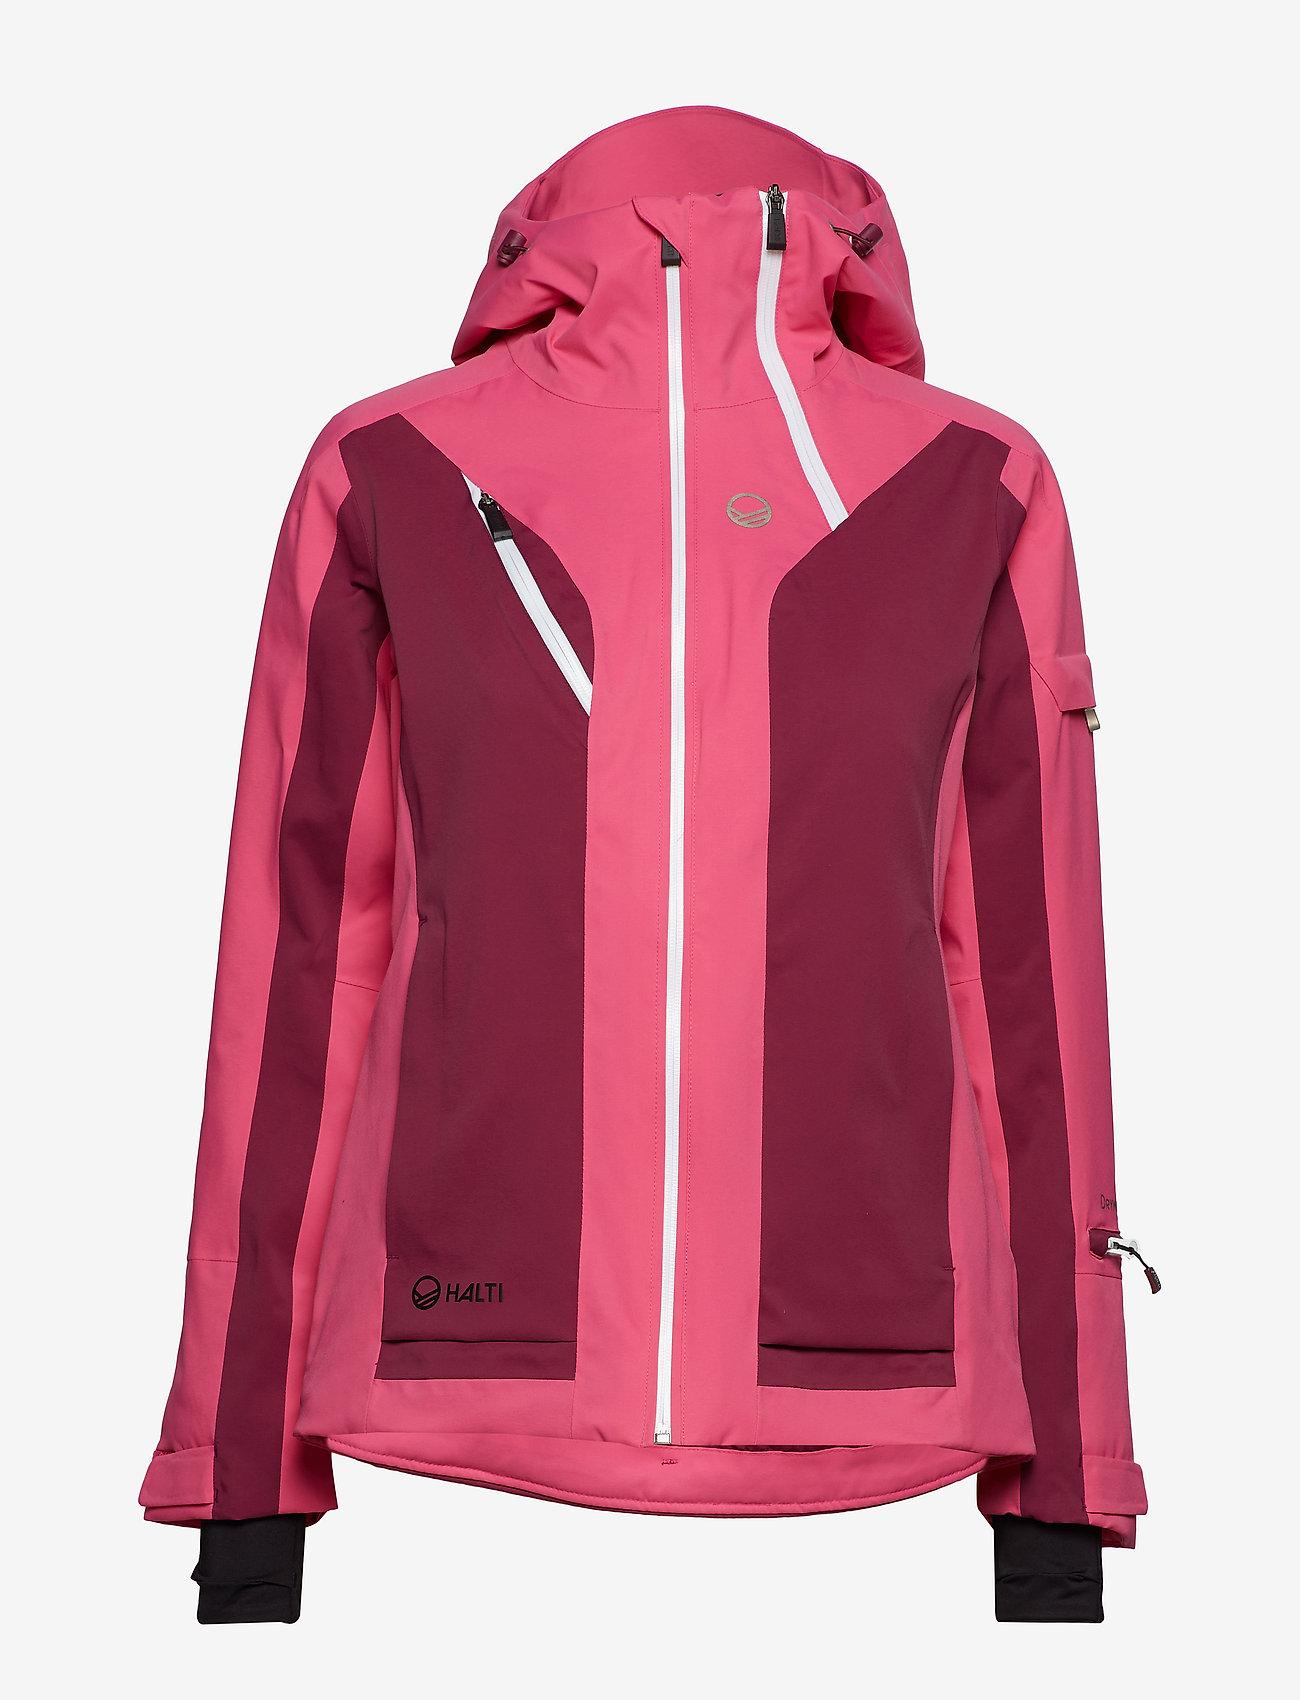 Podium W Dx Ski Jacket (Fuchsia Purple) - Halti nM2pKk